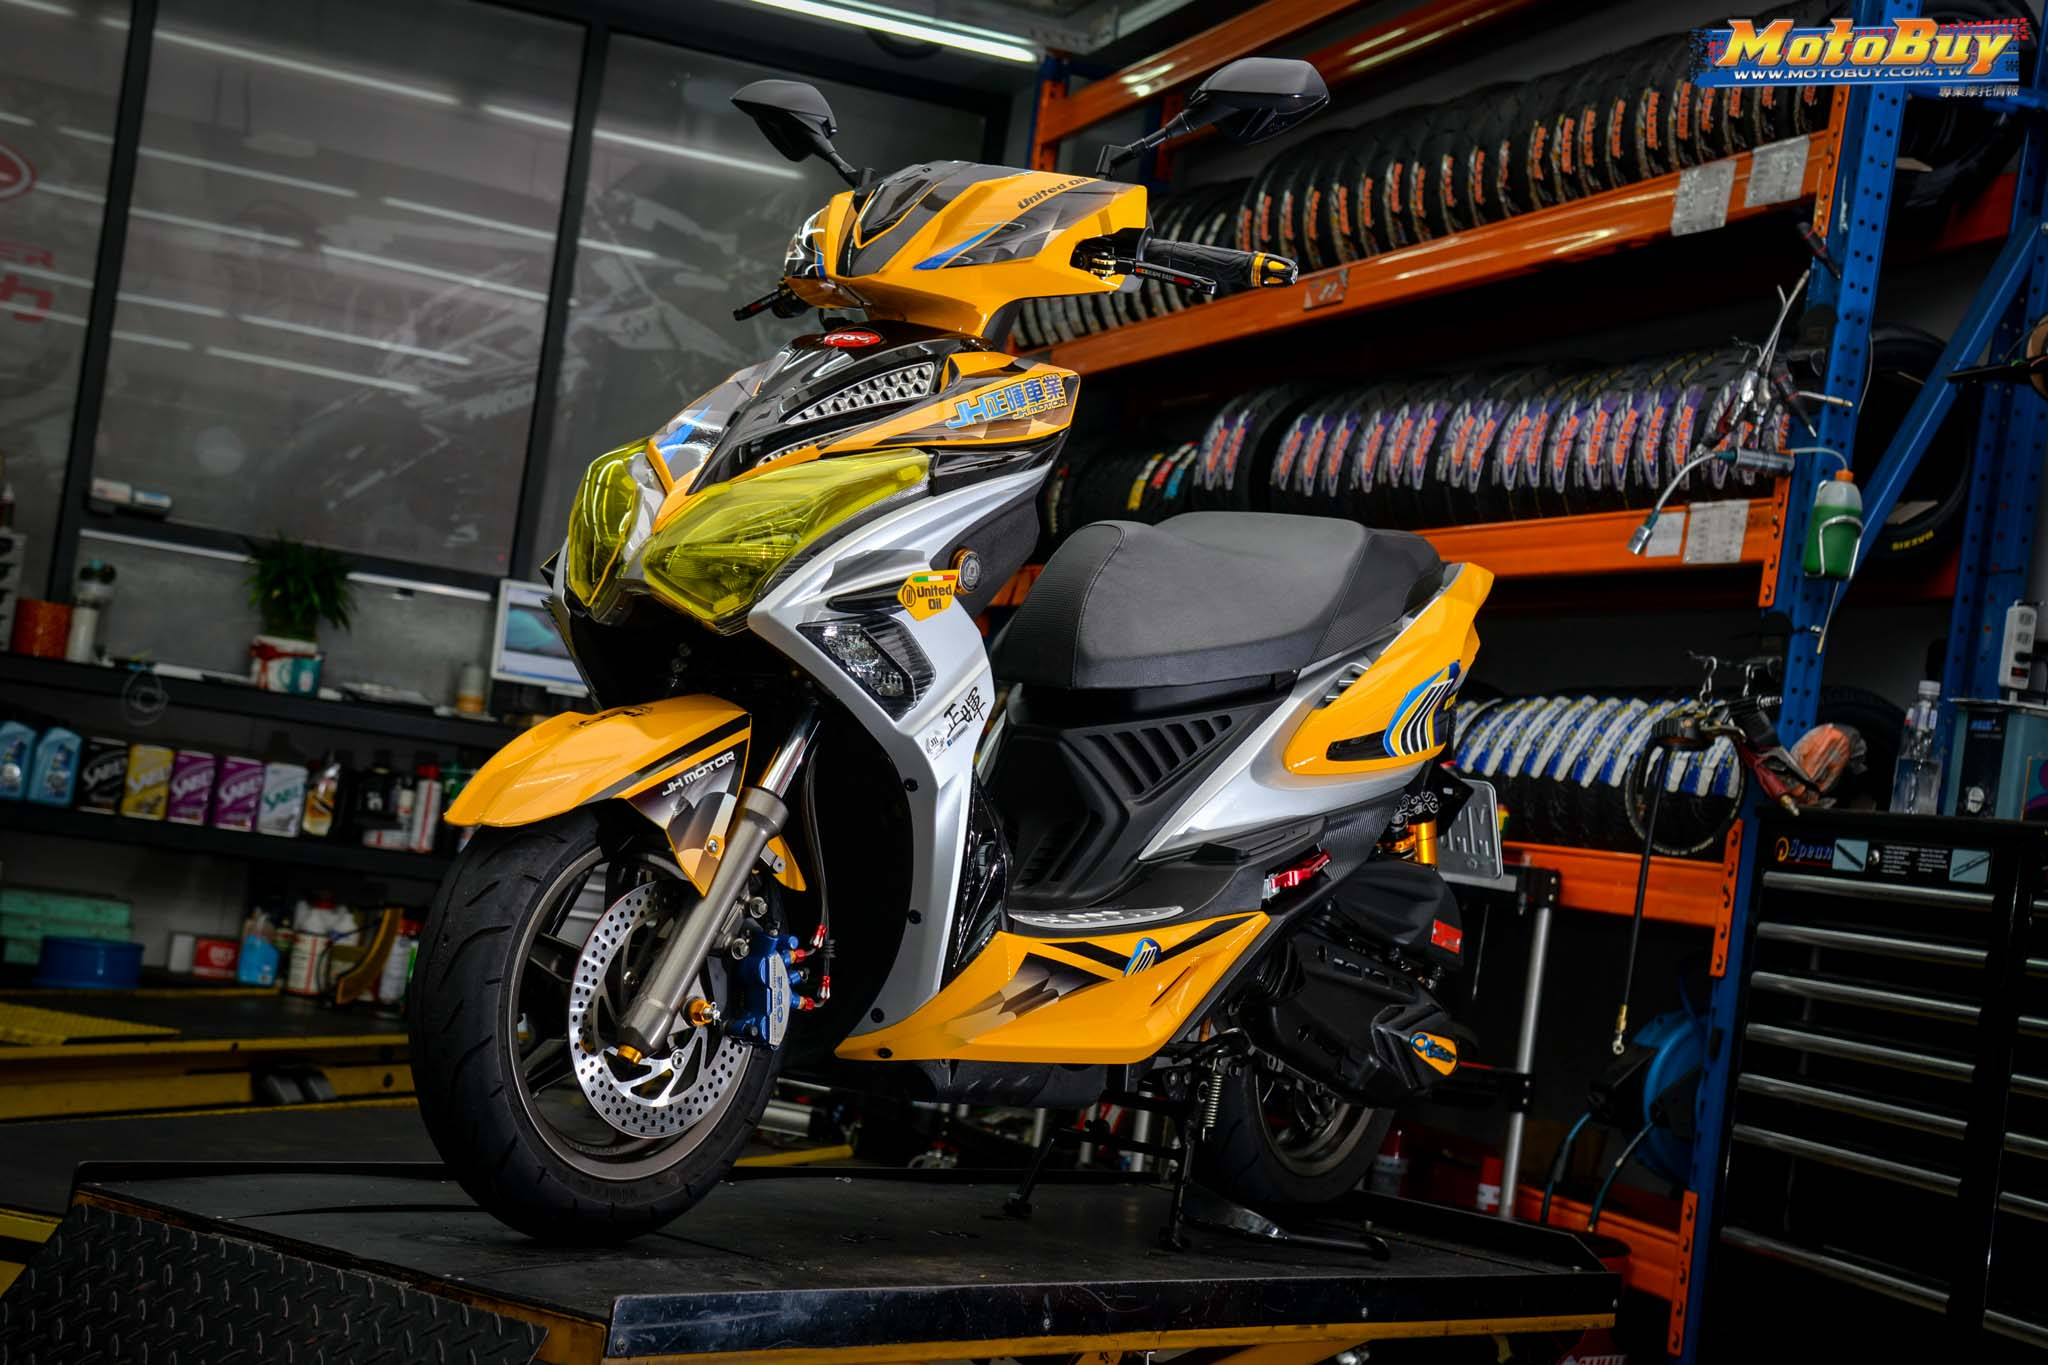 [夯車分享] 黃色閃電!PGO ALPHA MAX 125   MotoBuy